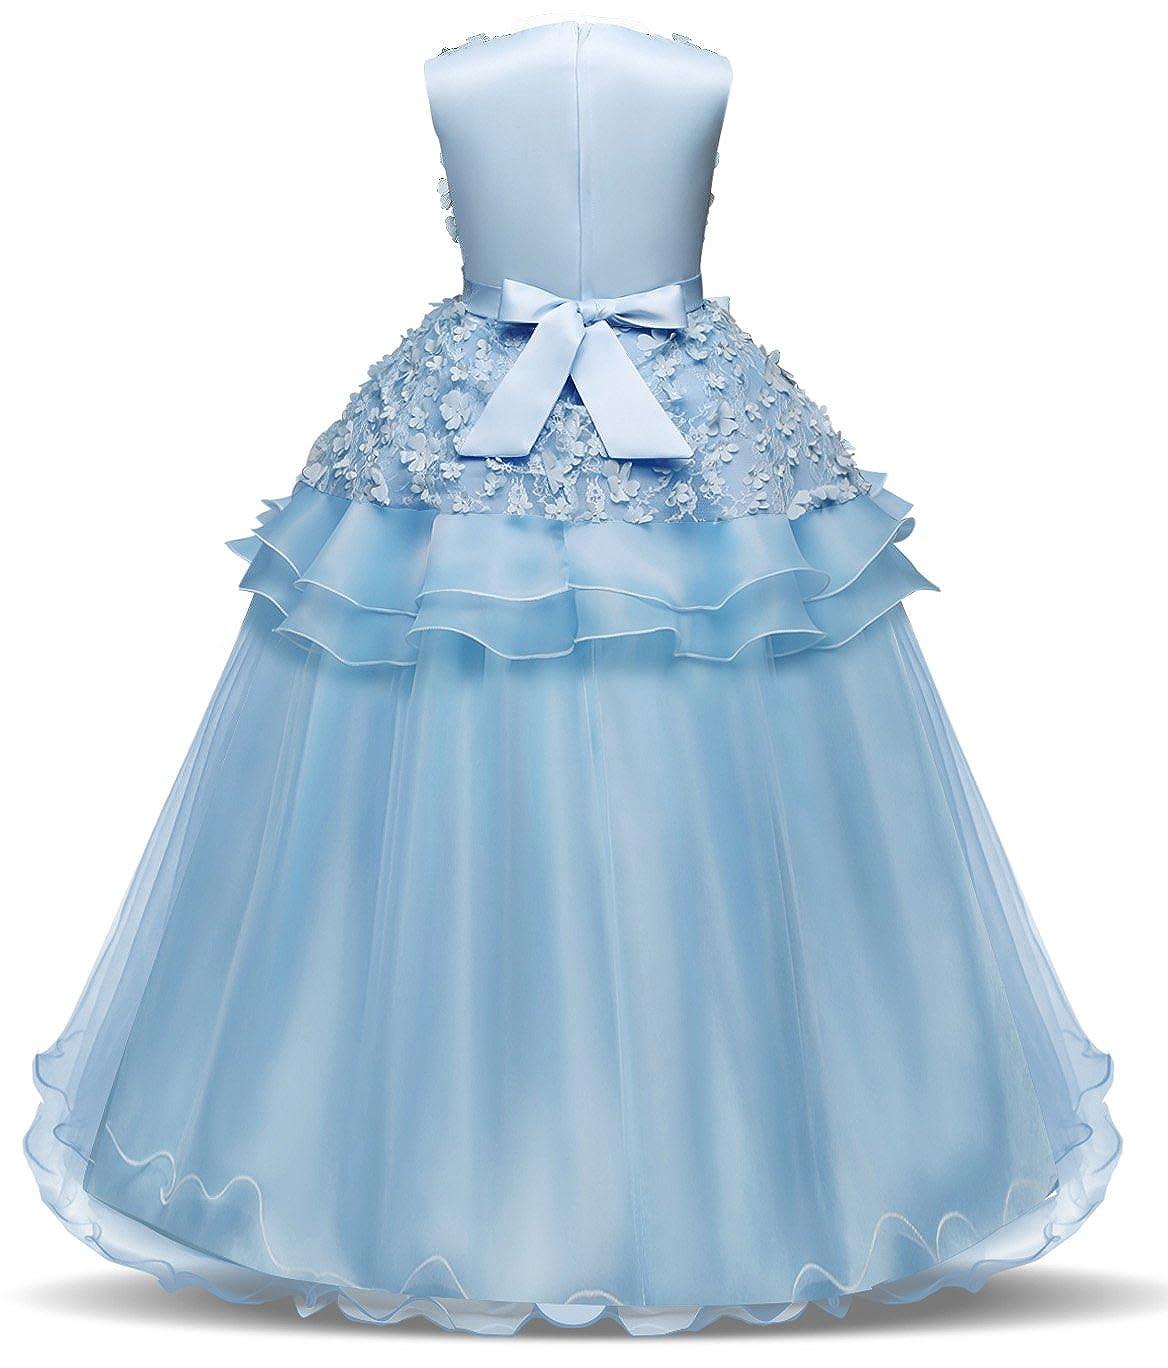 f6dda3c7927 Amazon.com  Bestfive Girls Floor Length Princess Dresses Kids Sleeveless  Wedding Party Prom Ball Gowns Dress 5-14 Years  Clothing